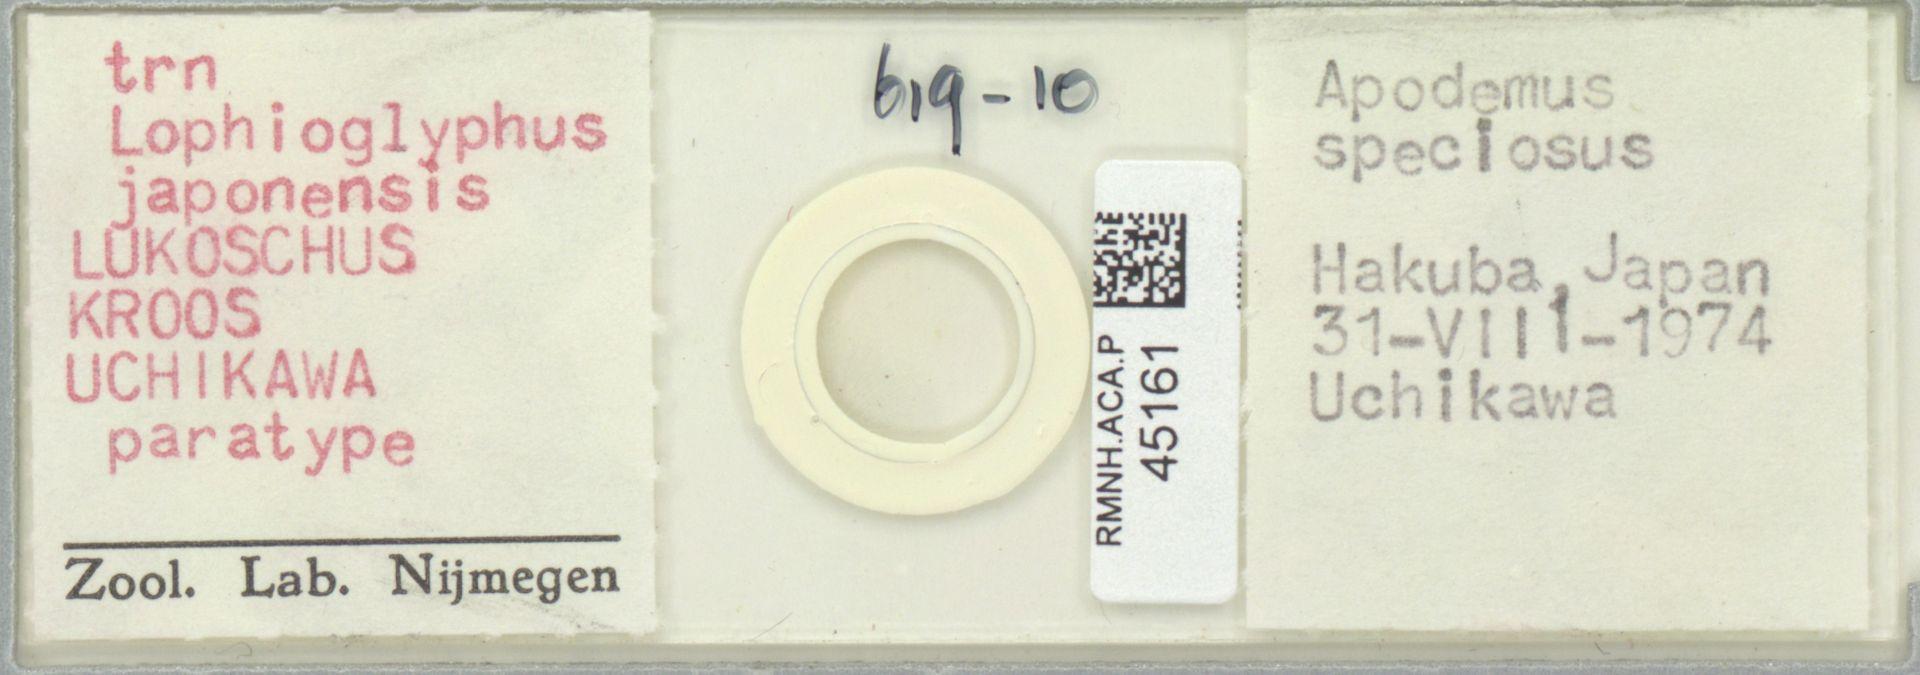 RMNH.ACA.P.45161 | Lophioglyphus japonensis Lukoschus, Kroos & Uchikawa